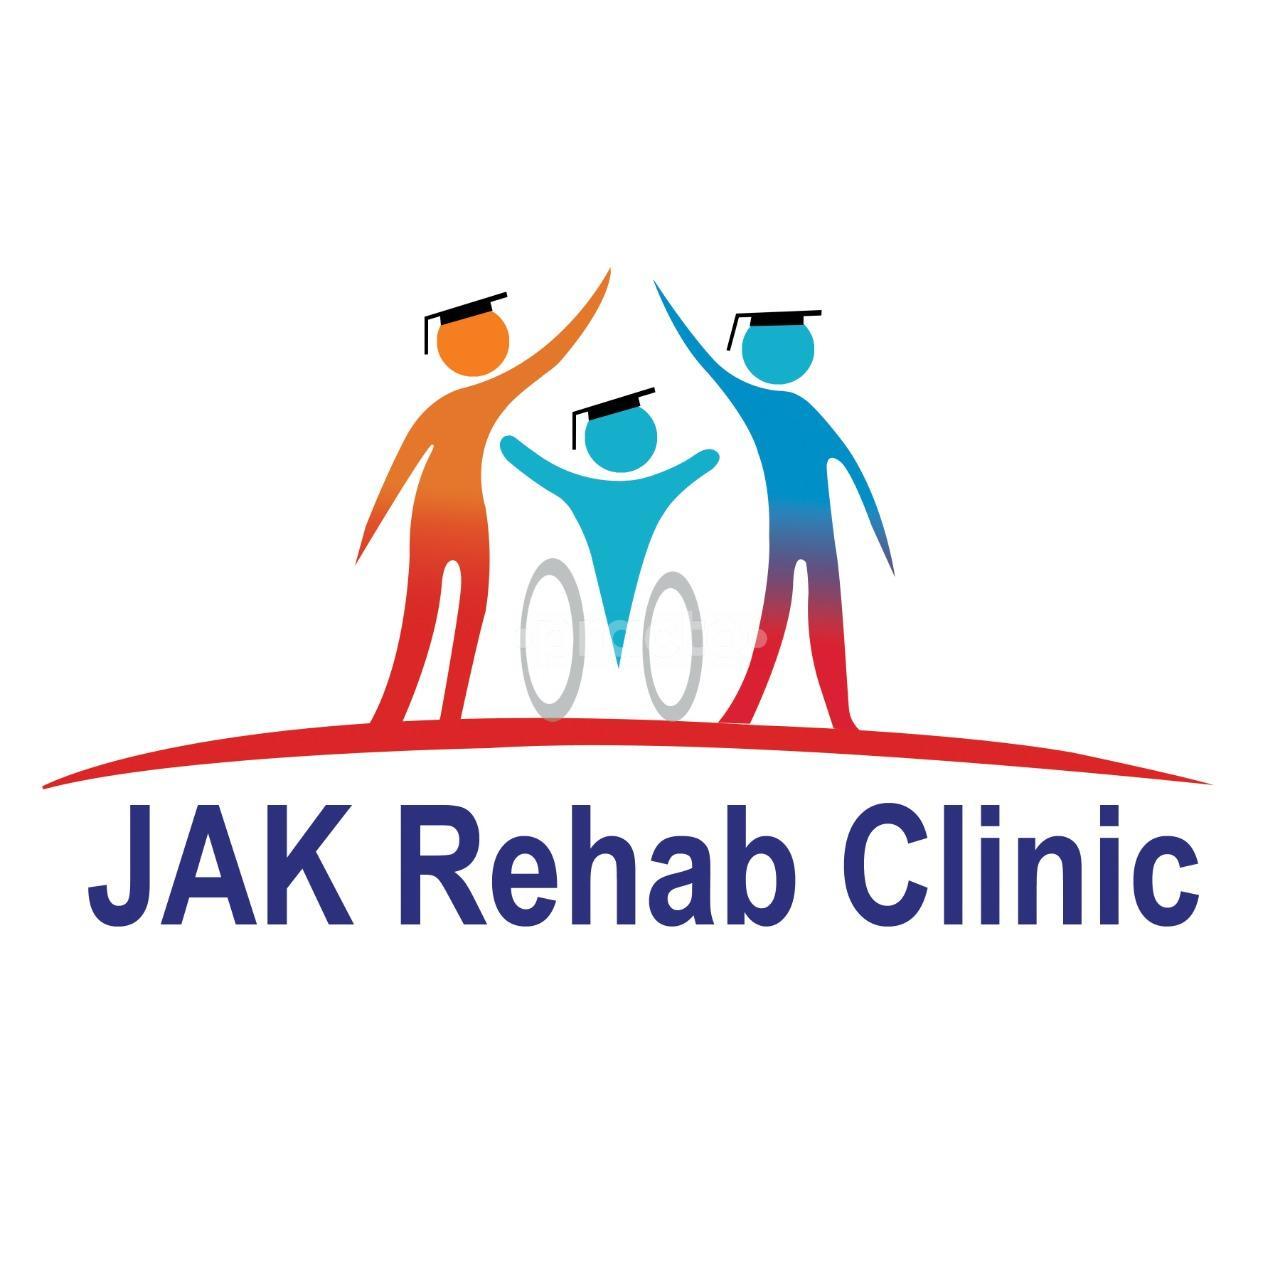 JAK Rehab Clinic